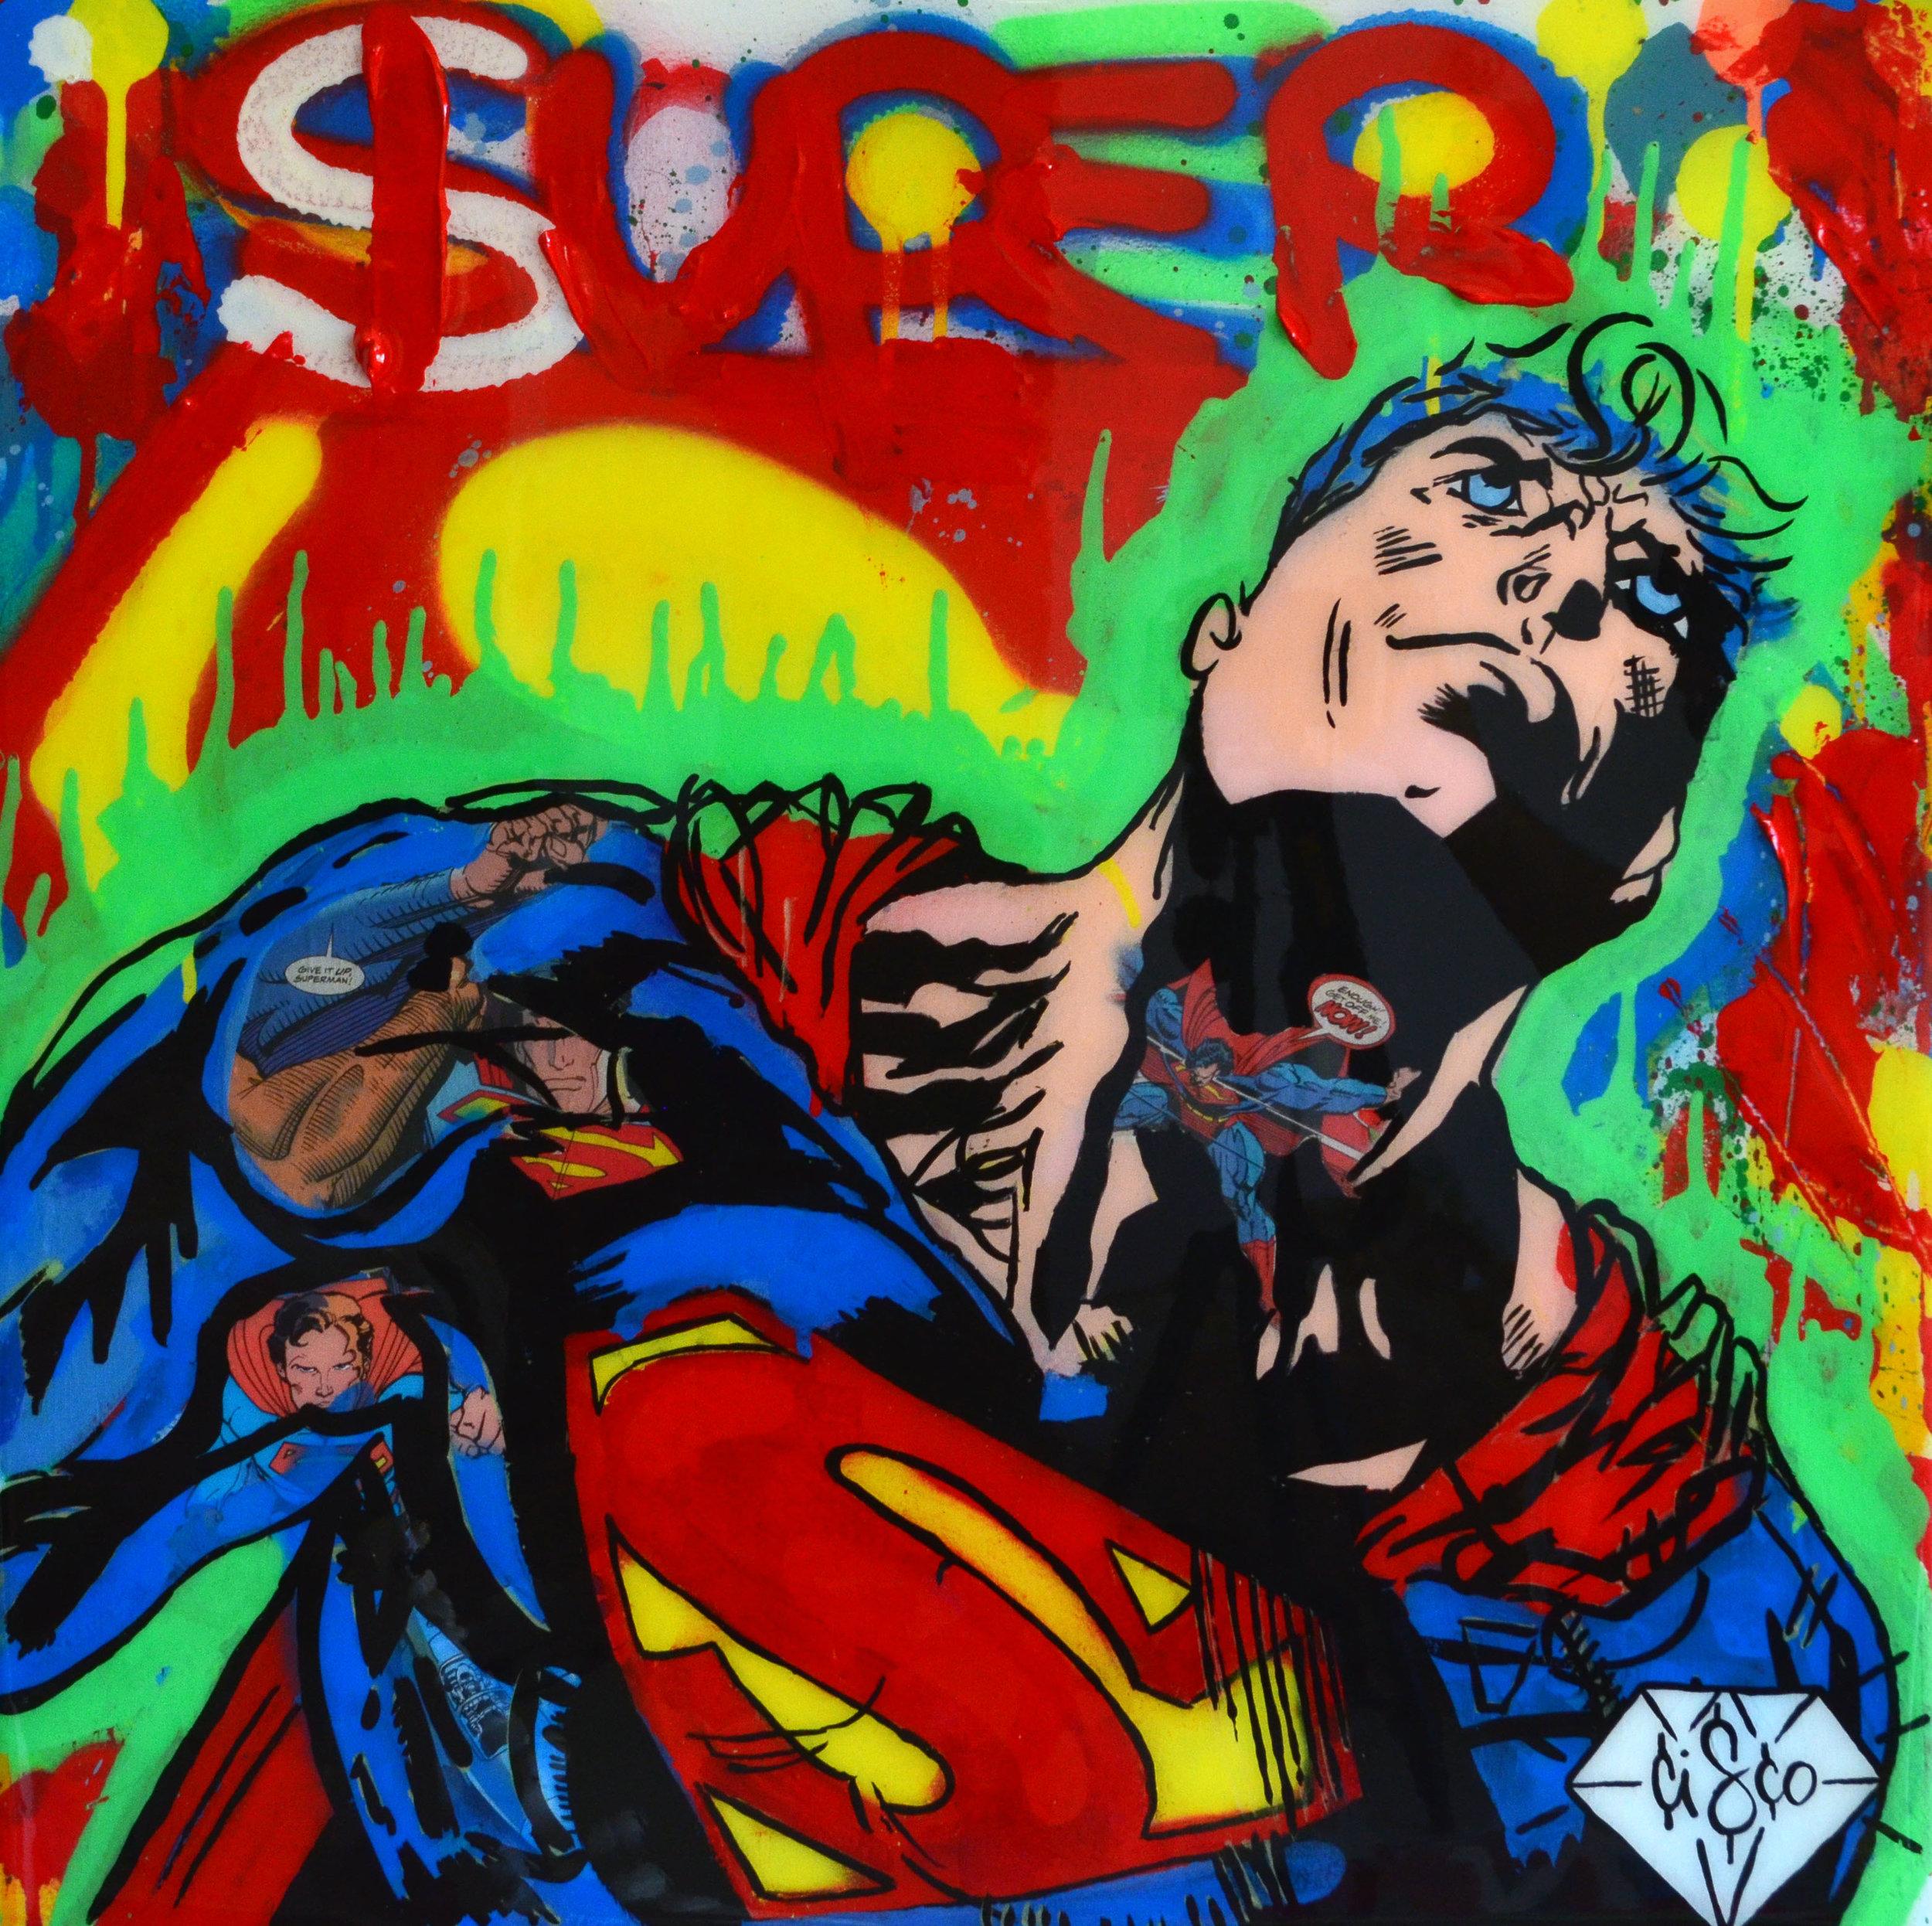 Cisco Lopez Jr Art_Cisco_Superman_22inx22in_Acrylic On Wood Panel Canvas_Edition1of1_2018_$1150.jpg